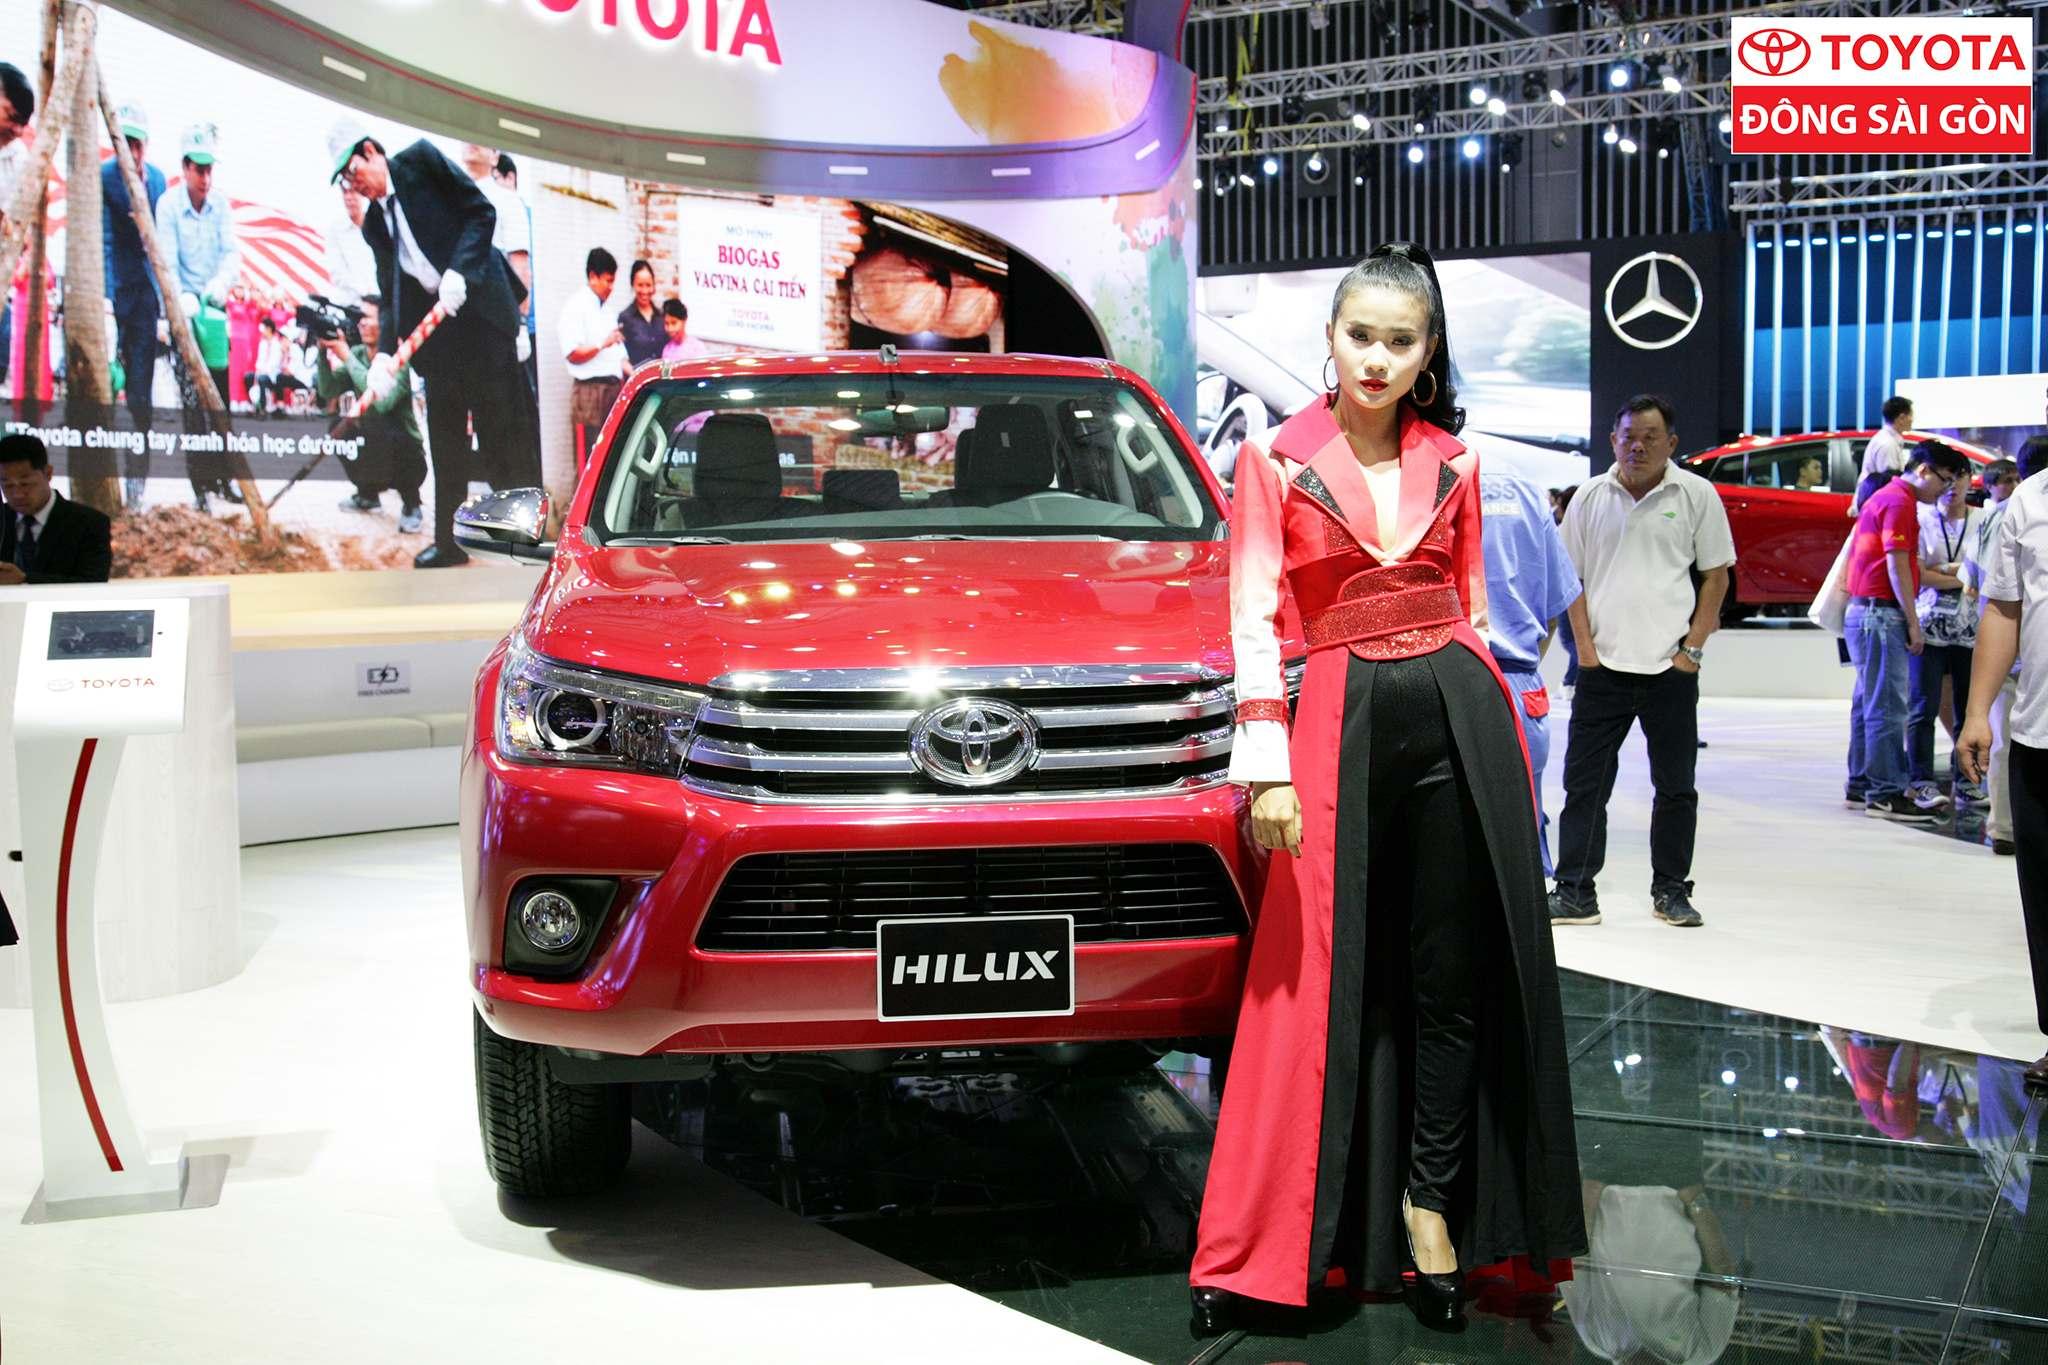 vietnam motor show 20175 Toyota at Vietnam Motor Show 2017